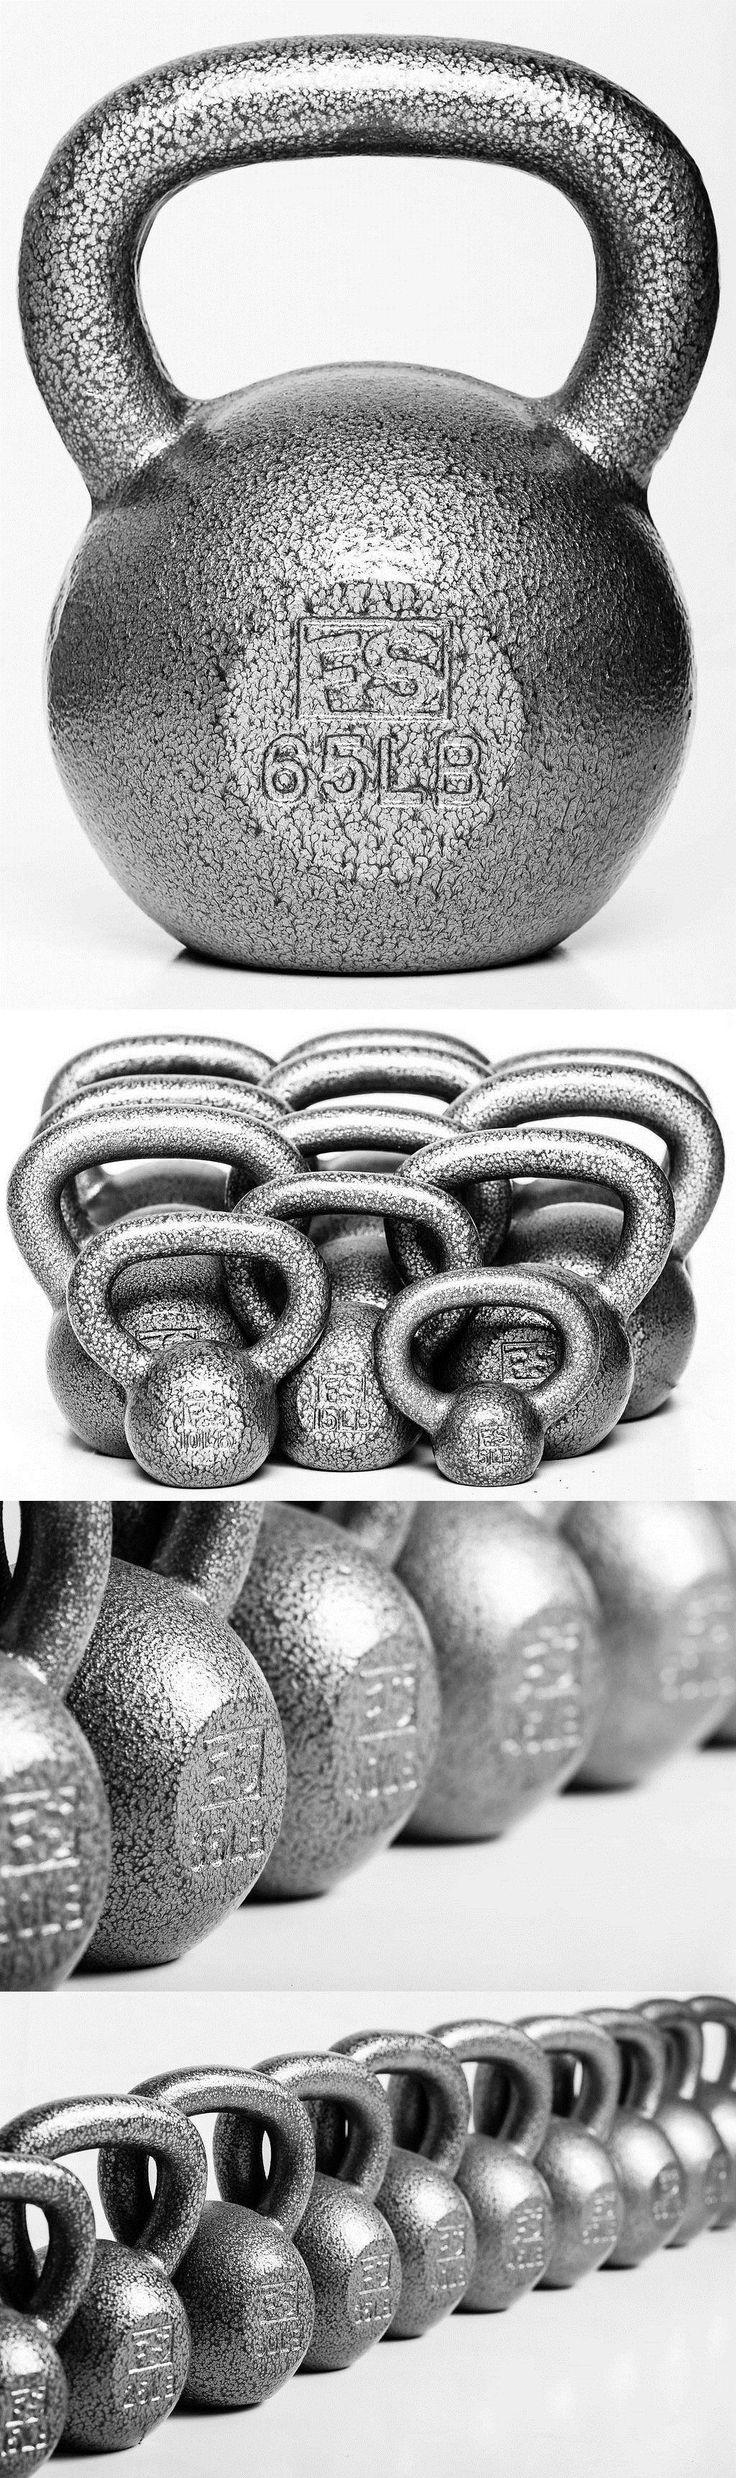 Kettlebells 179814: Grey Hammertone Kettlebell 25Lb -> BUY IT NOW ONLY: $37.99 on eBay!